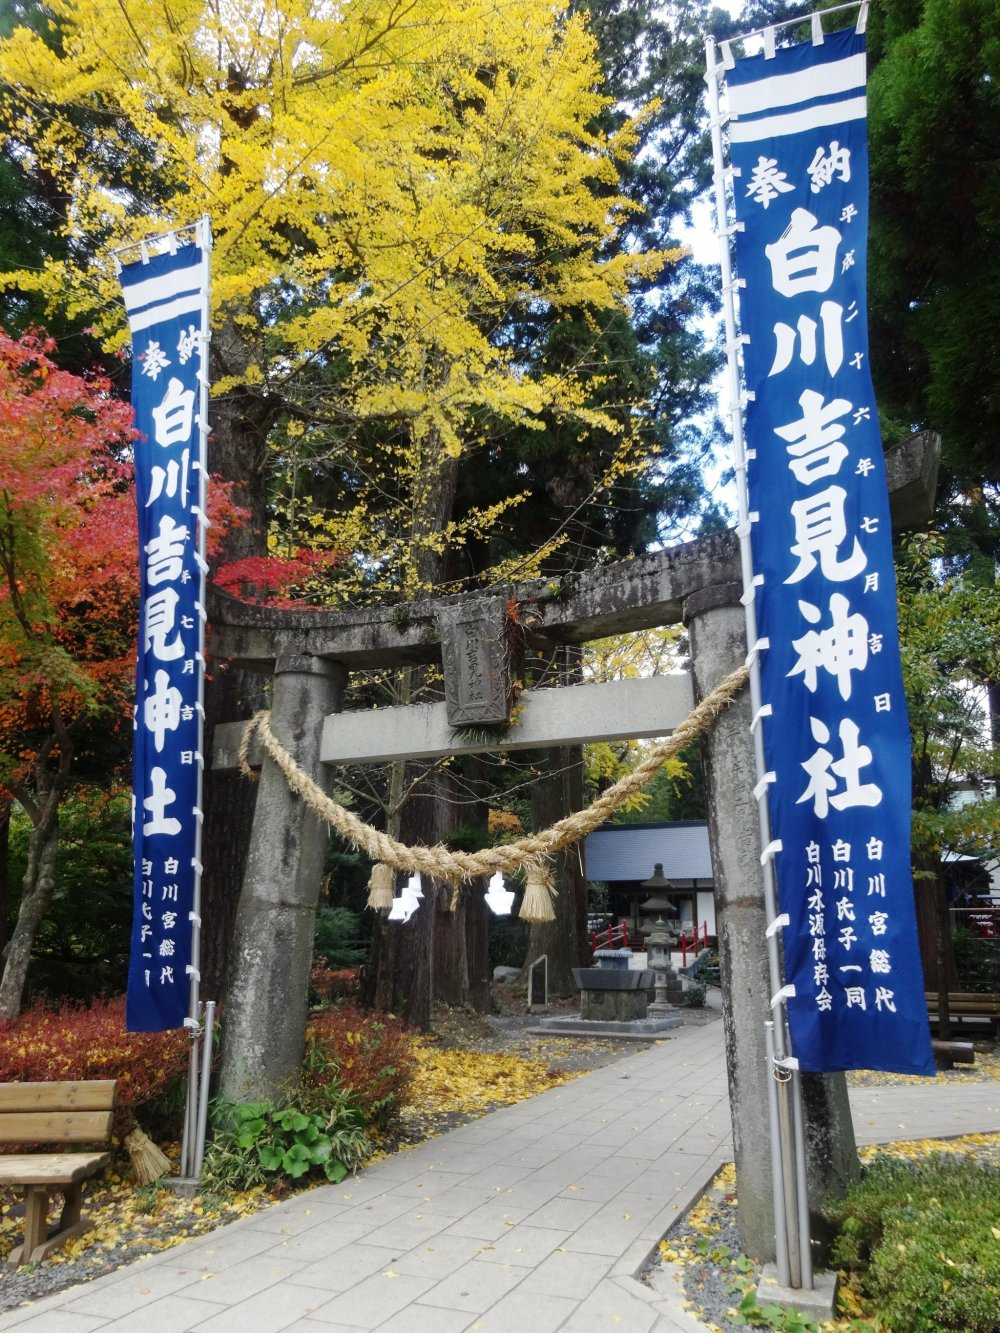 A torii gate marks the entrance to the Shirakawa water source